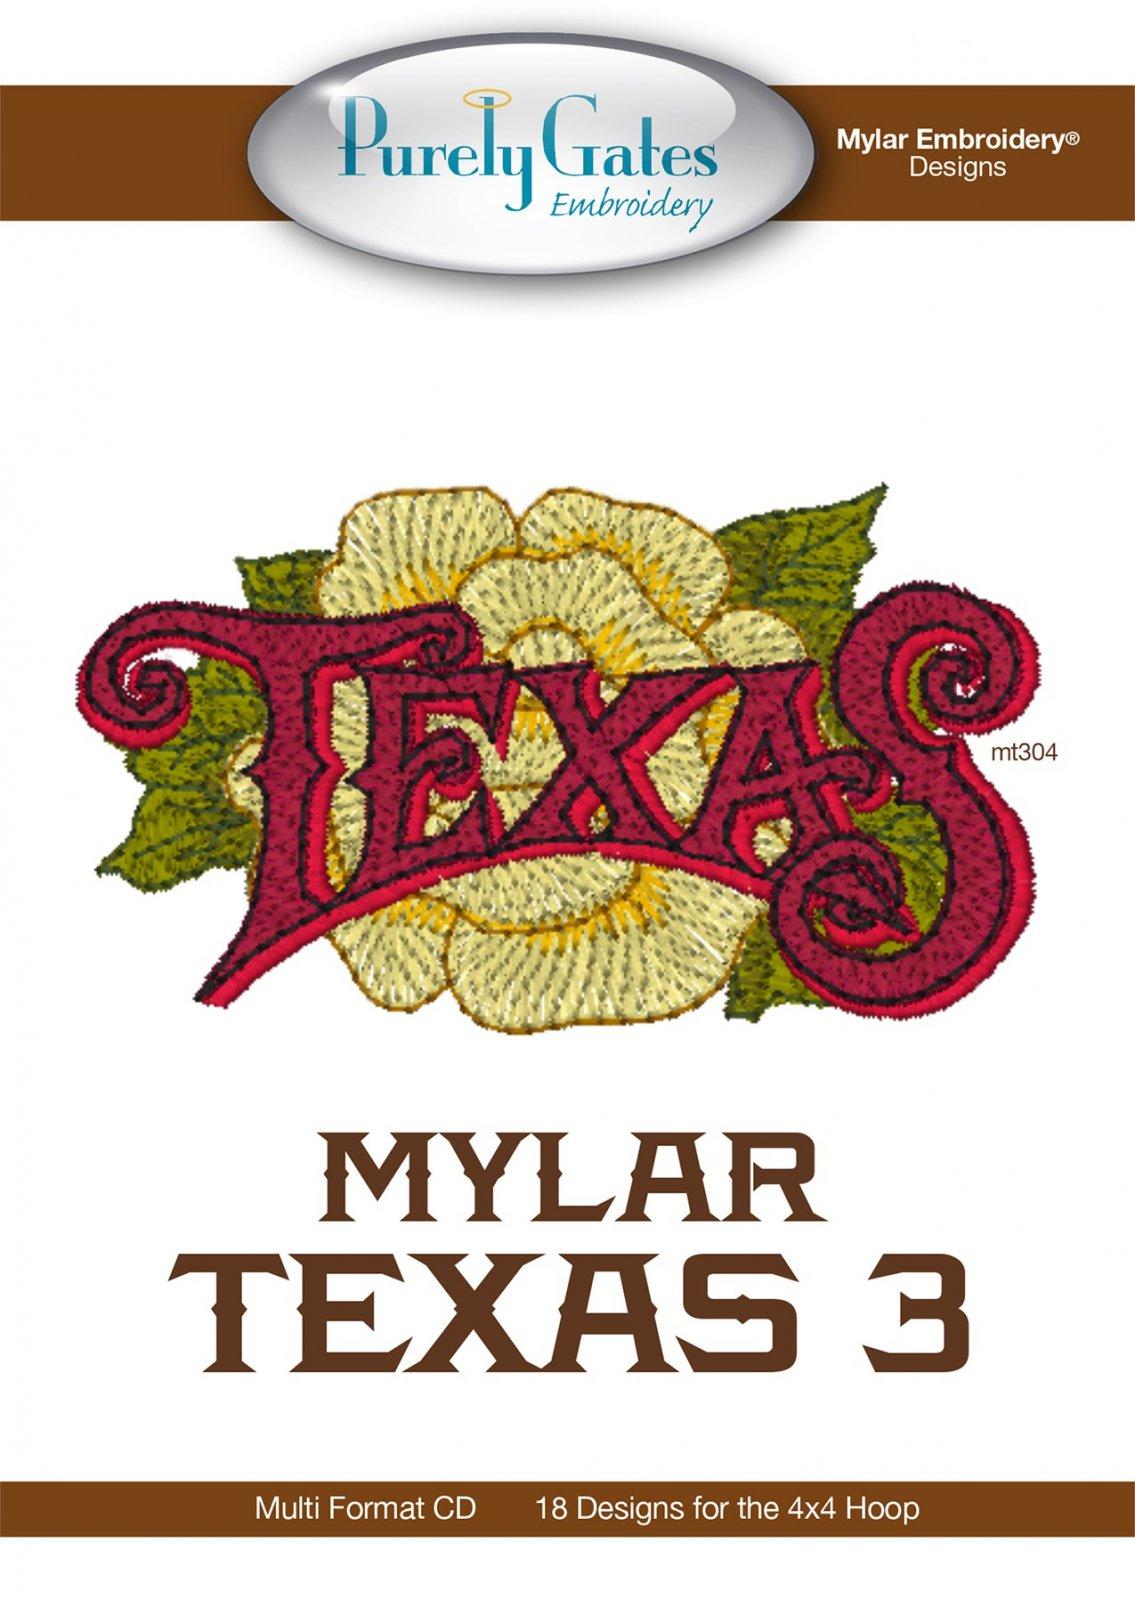 CD Mylar Embroidery CD Designs Mylar Texas 3